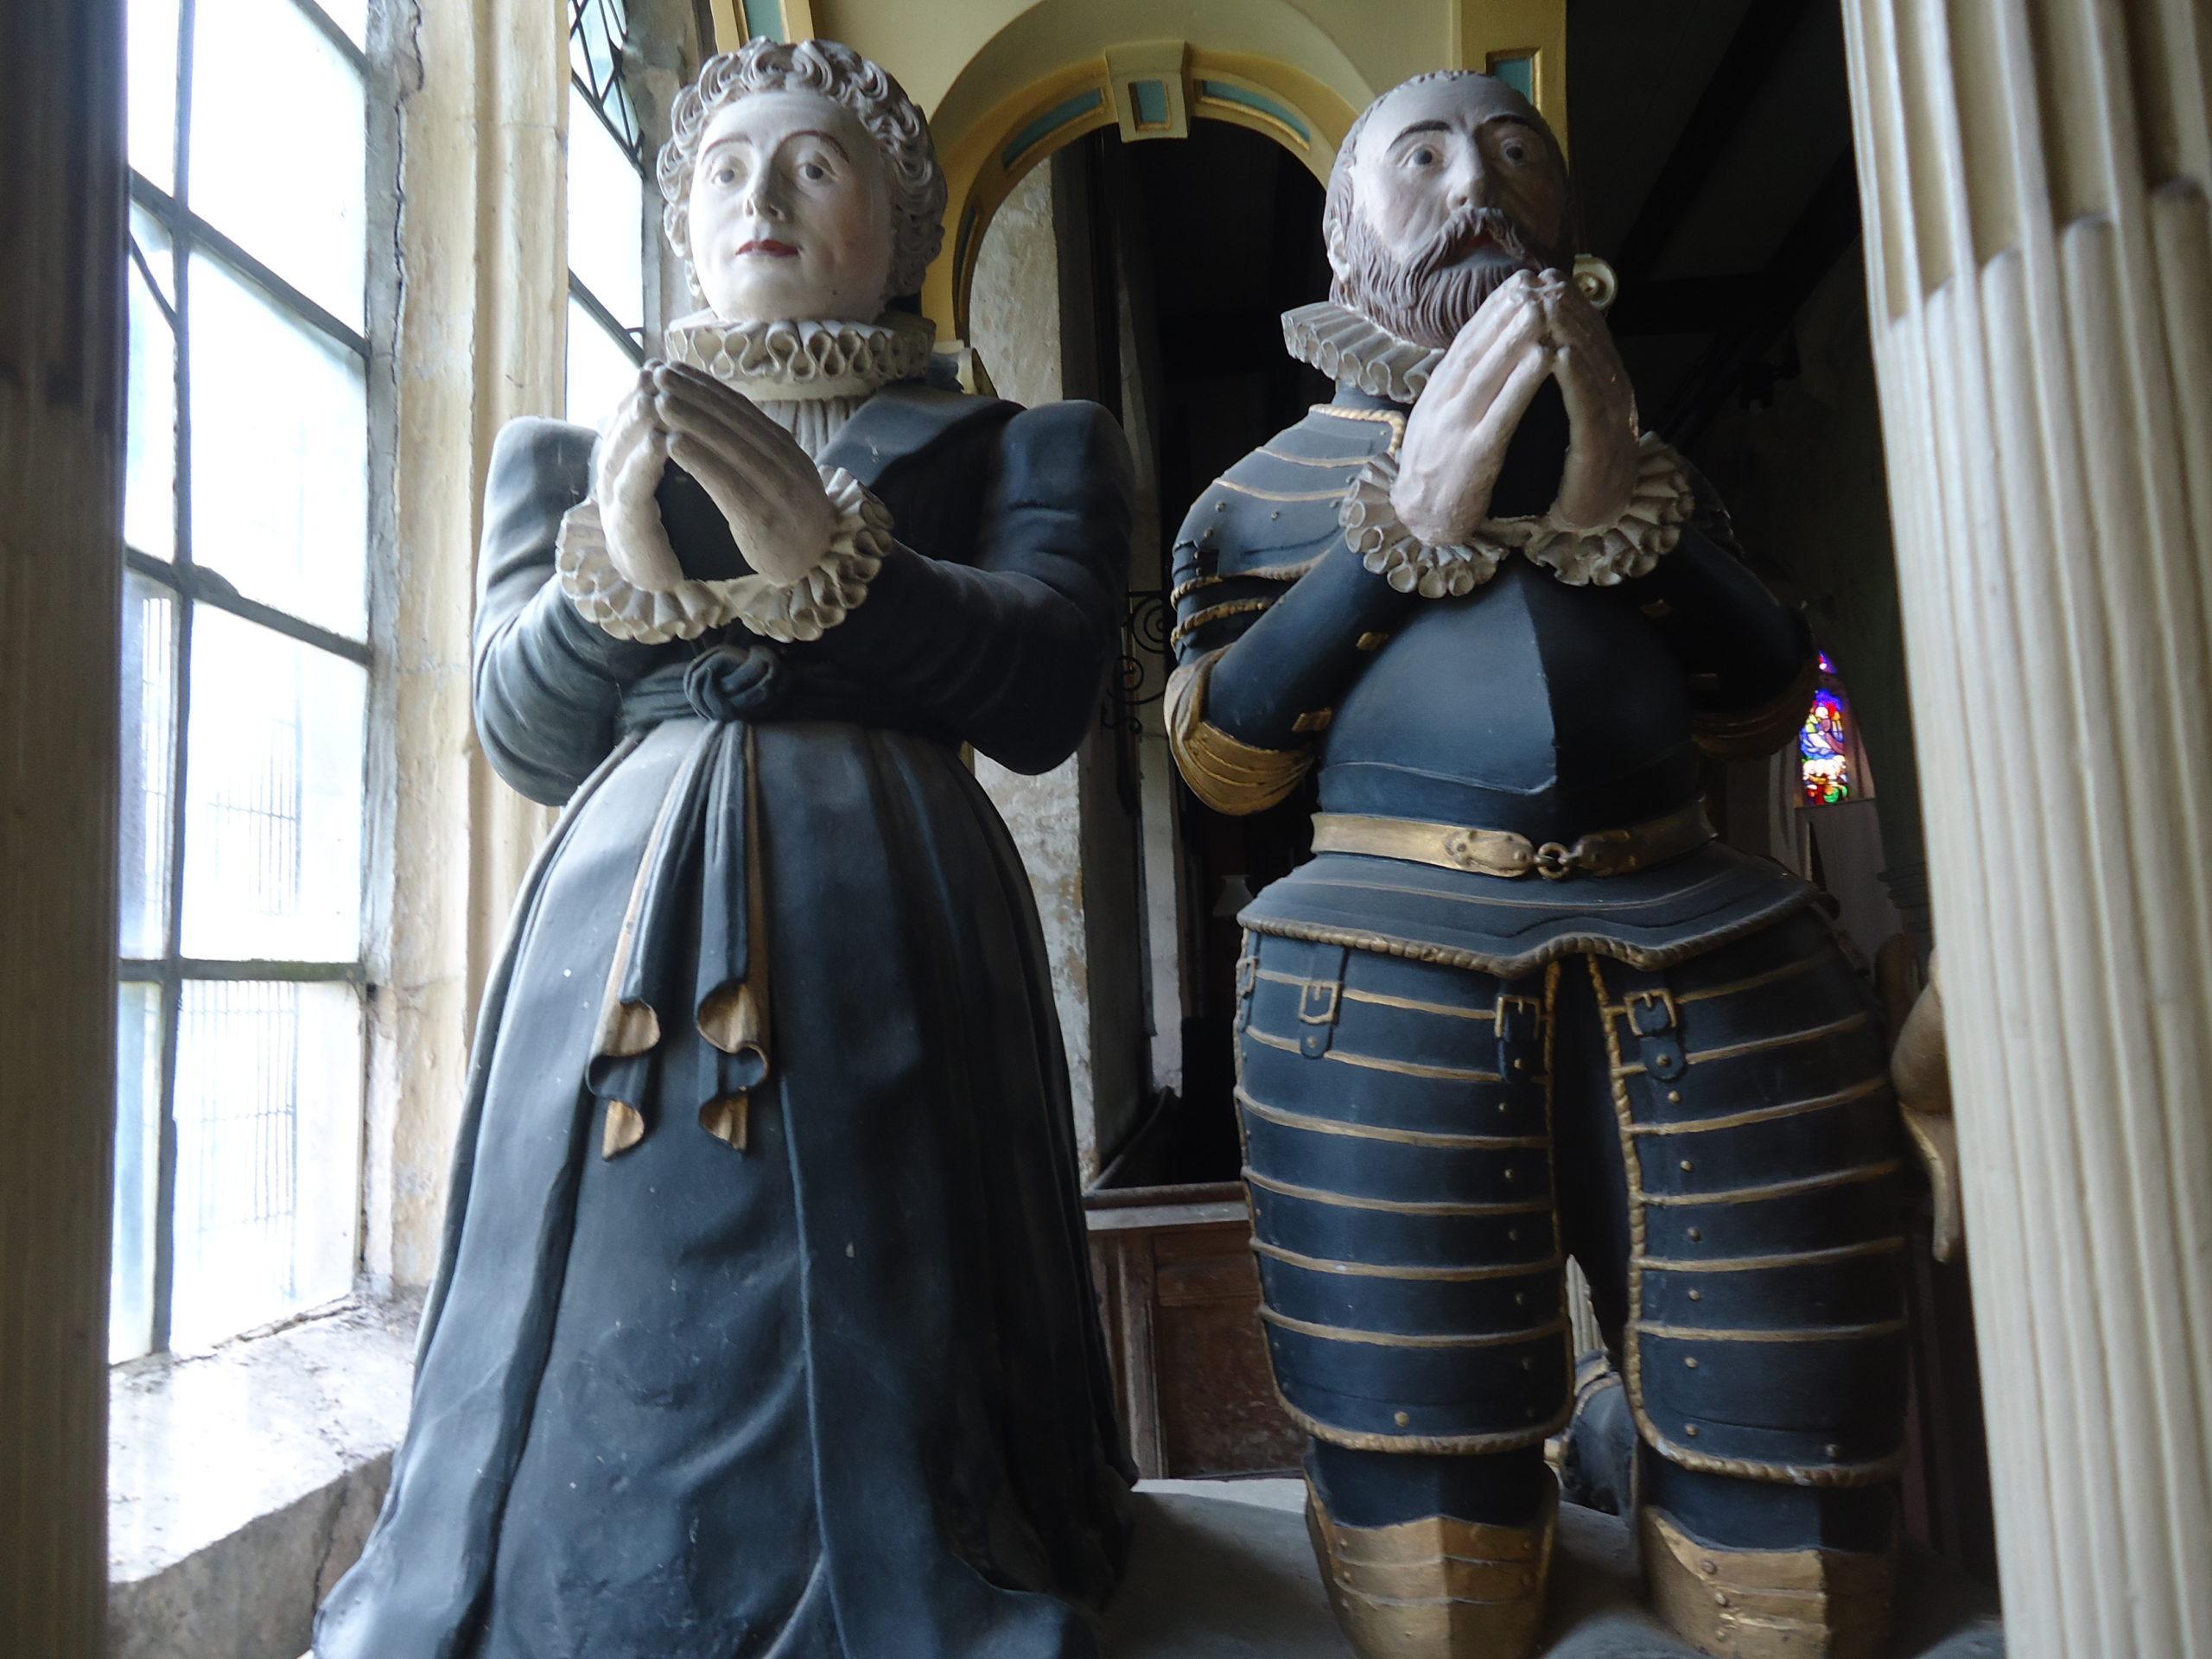 Nicholas St John and his wife Elizabeth Blount